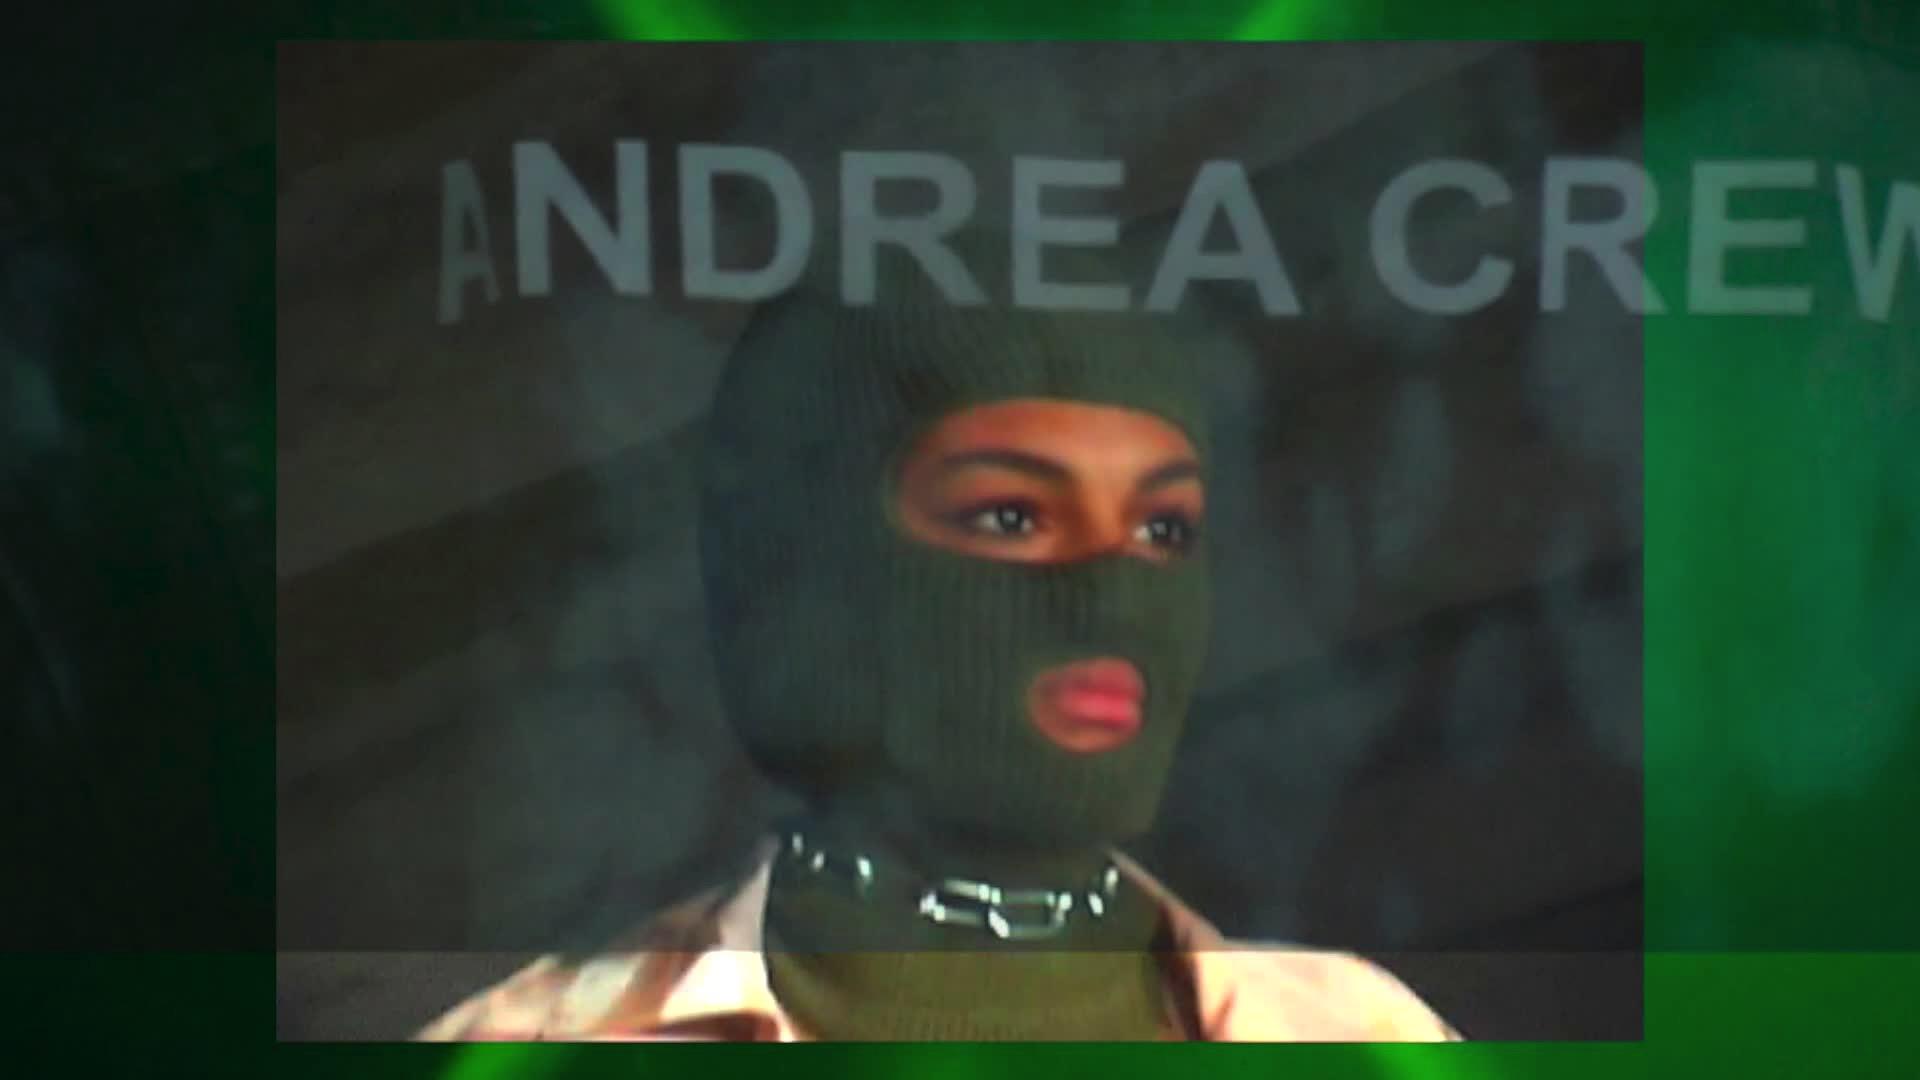 andrea-crews-aw19-198.jpg